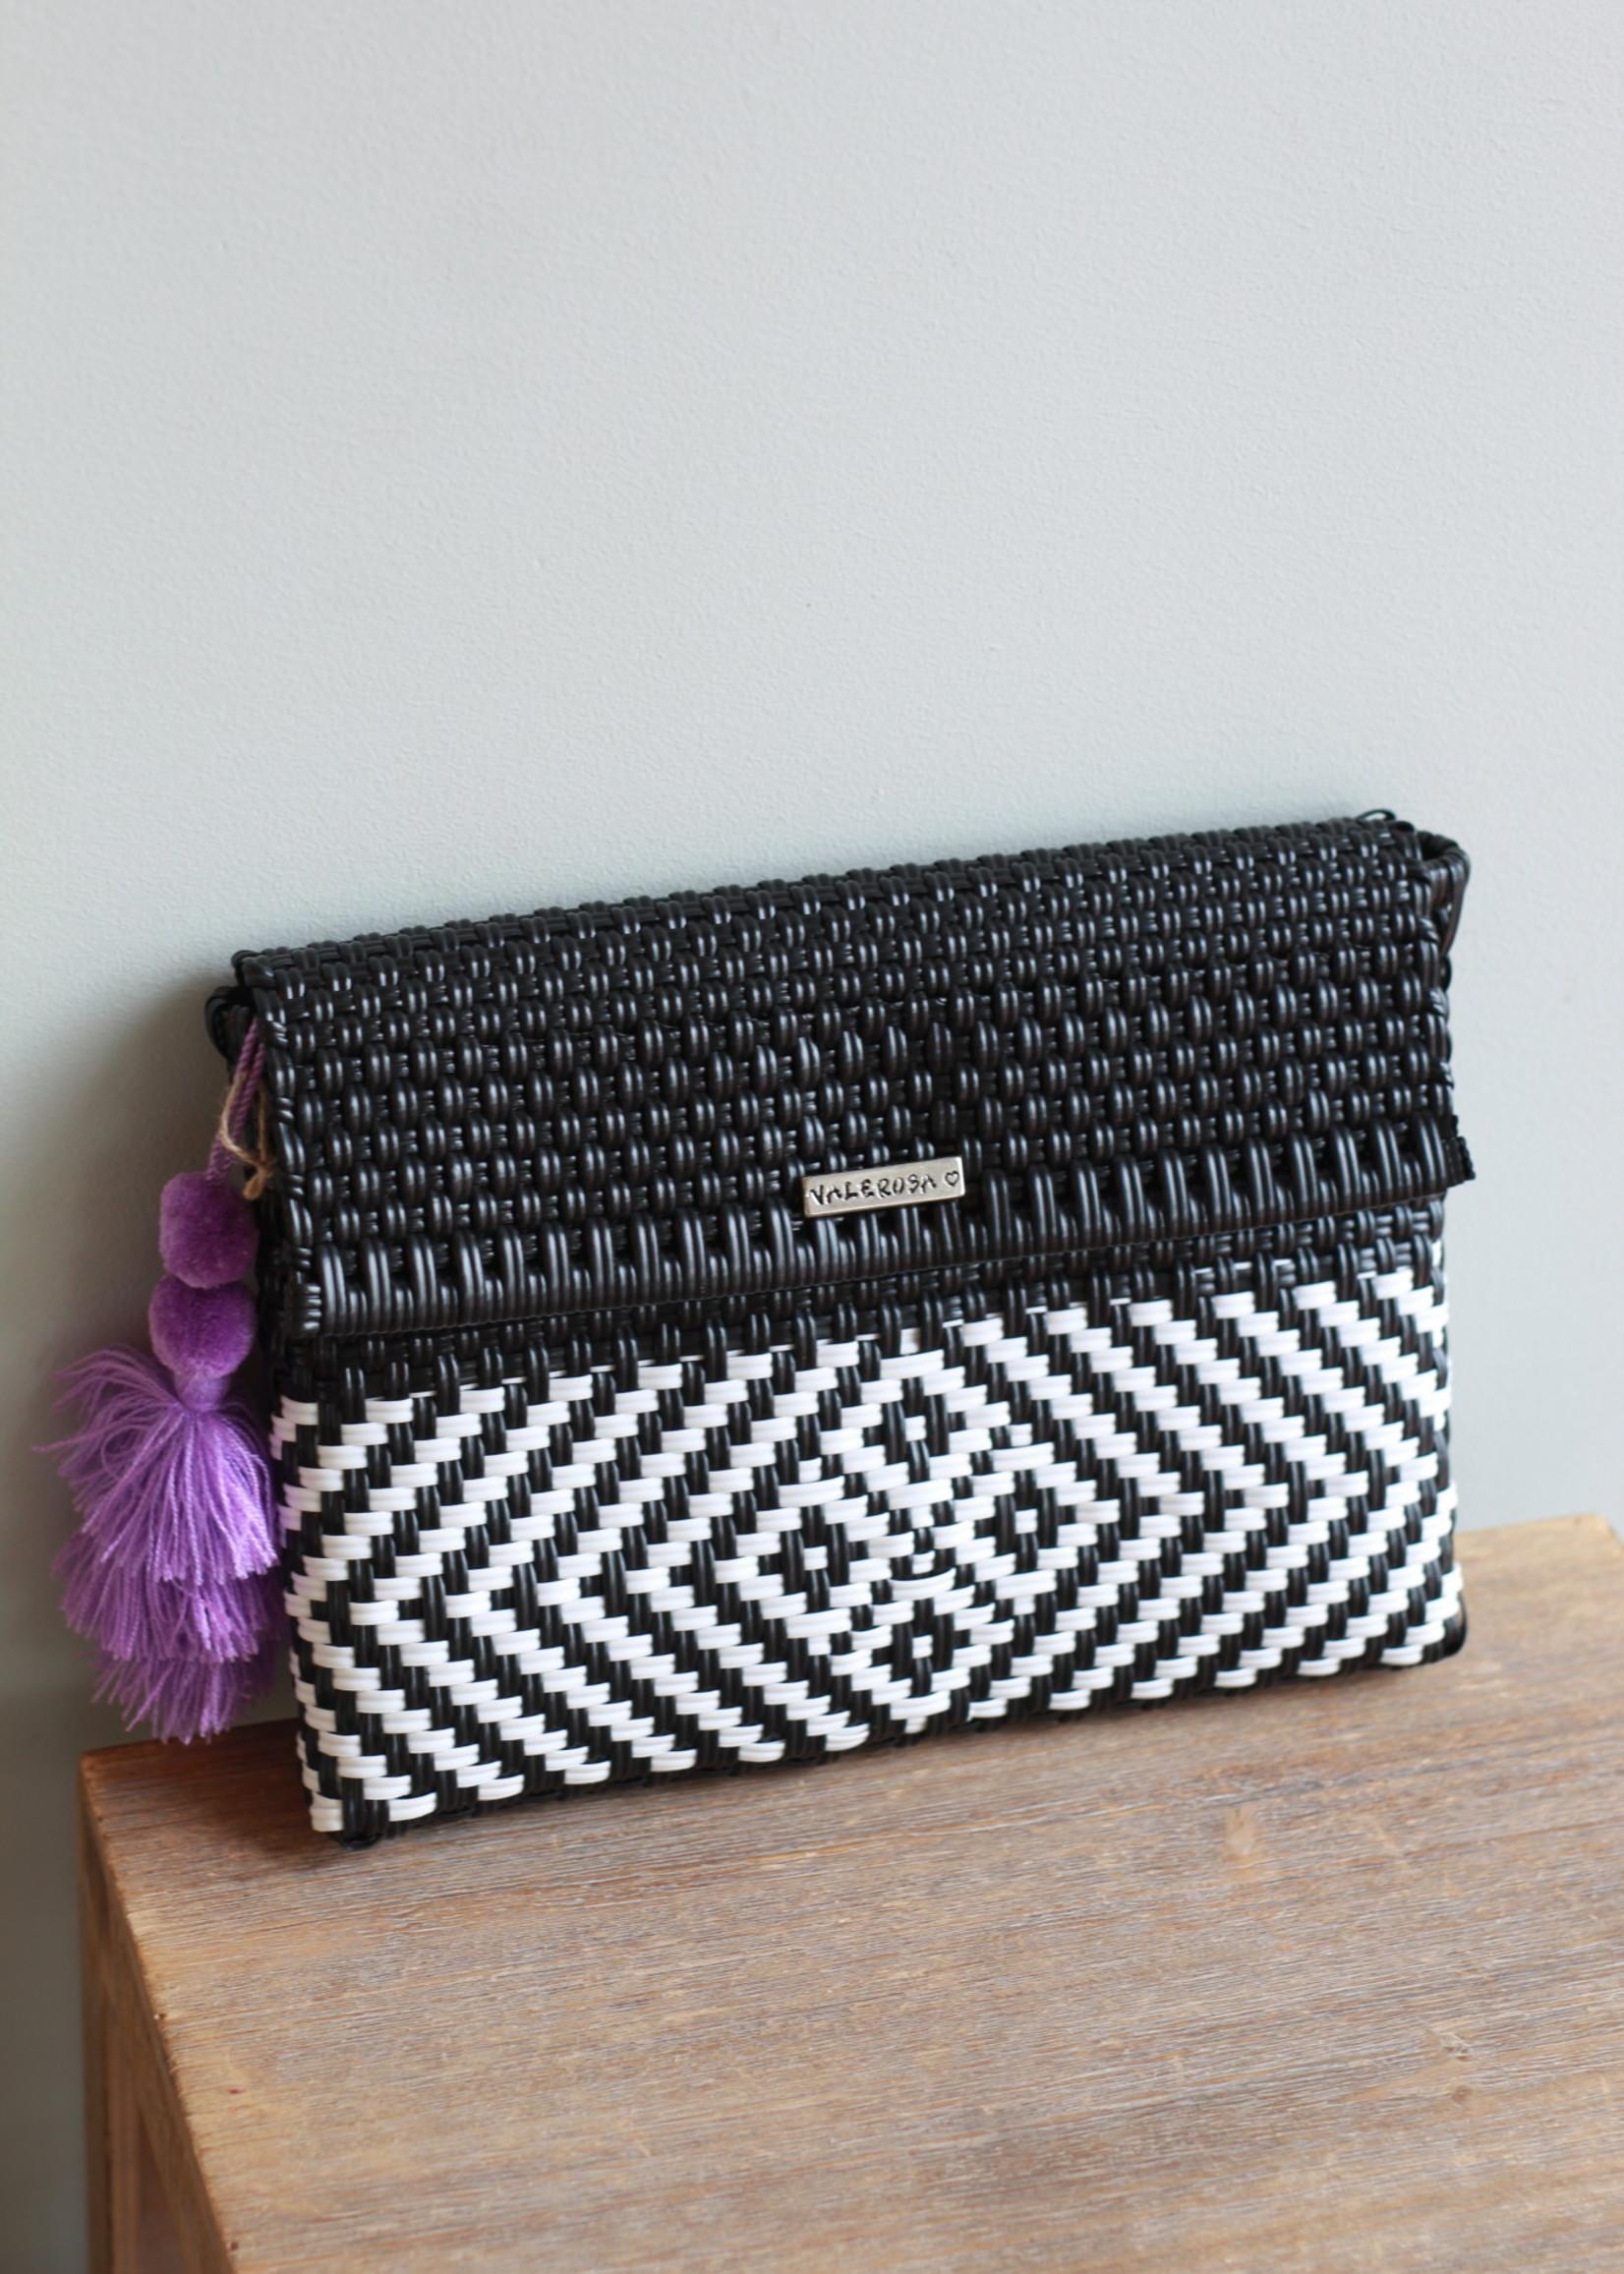 Valerosa Boutique Valerosa Black & White Clutch With Lavender Tassel